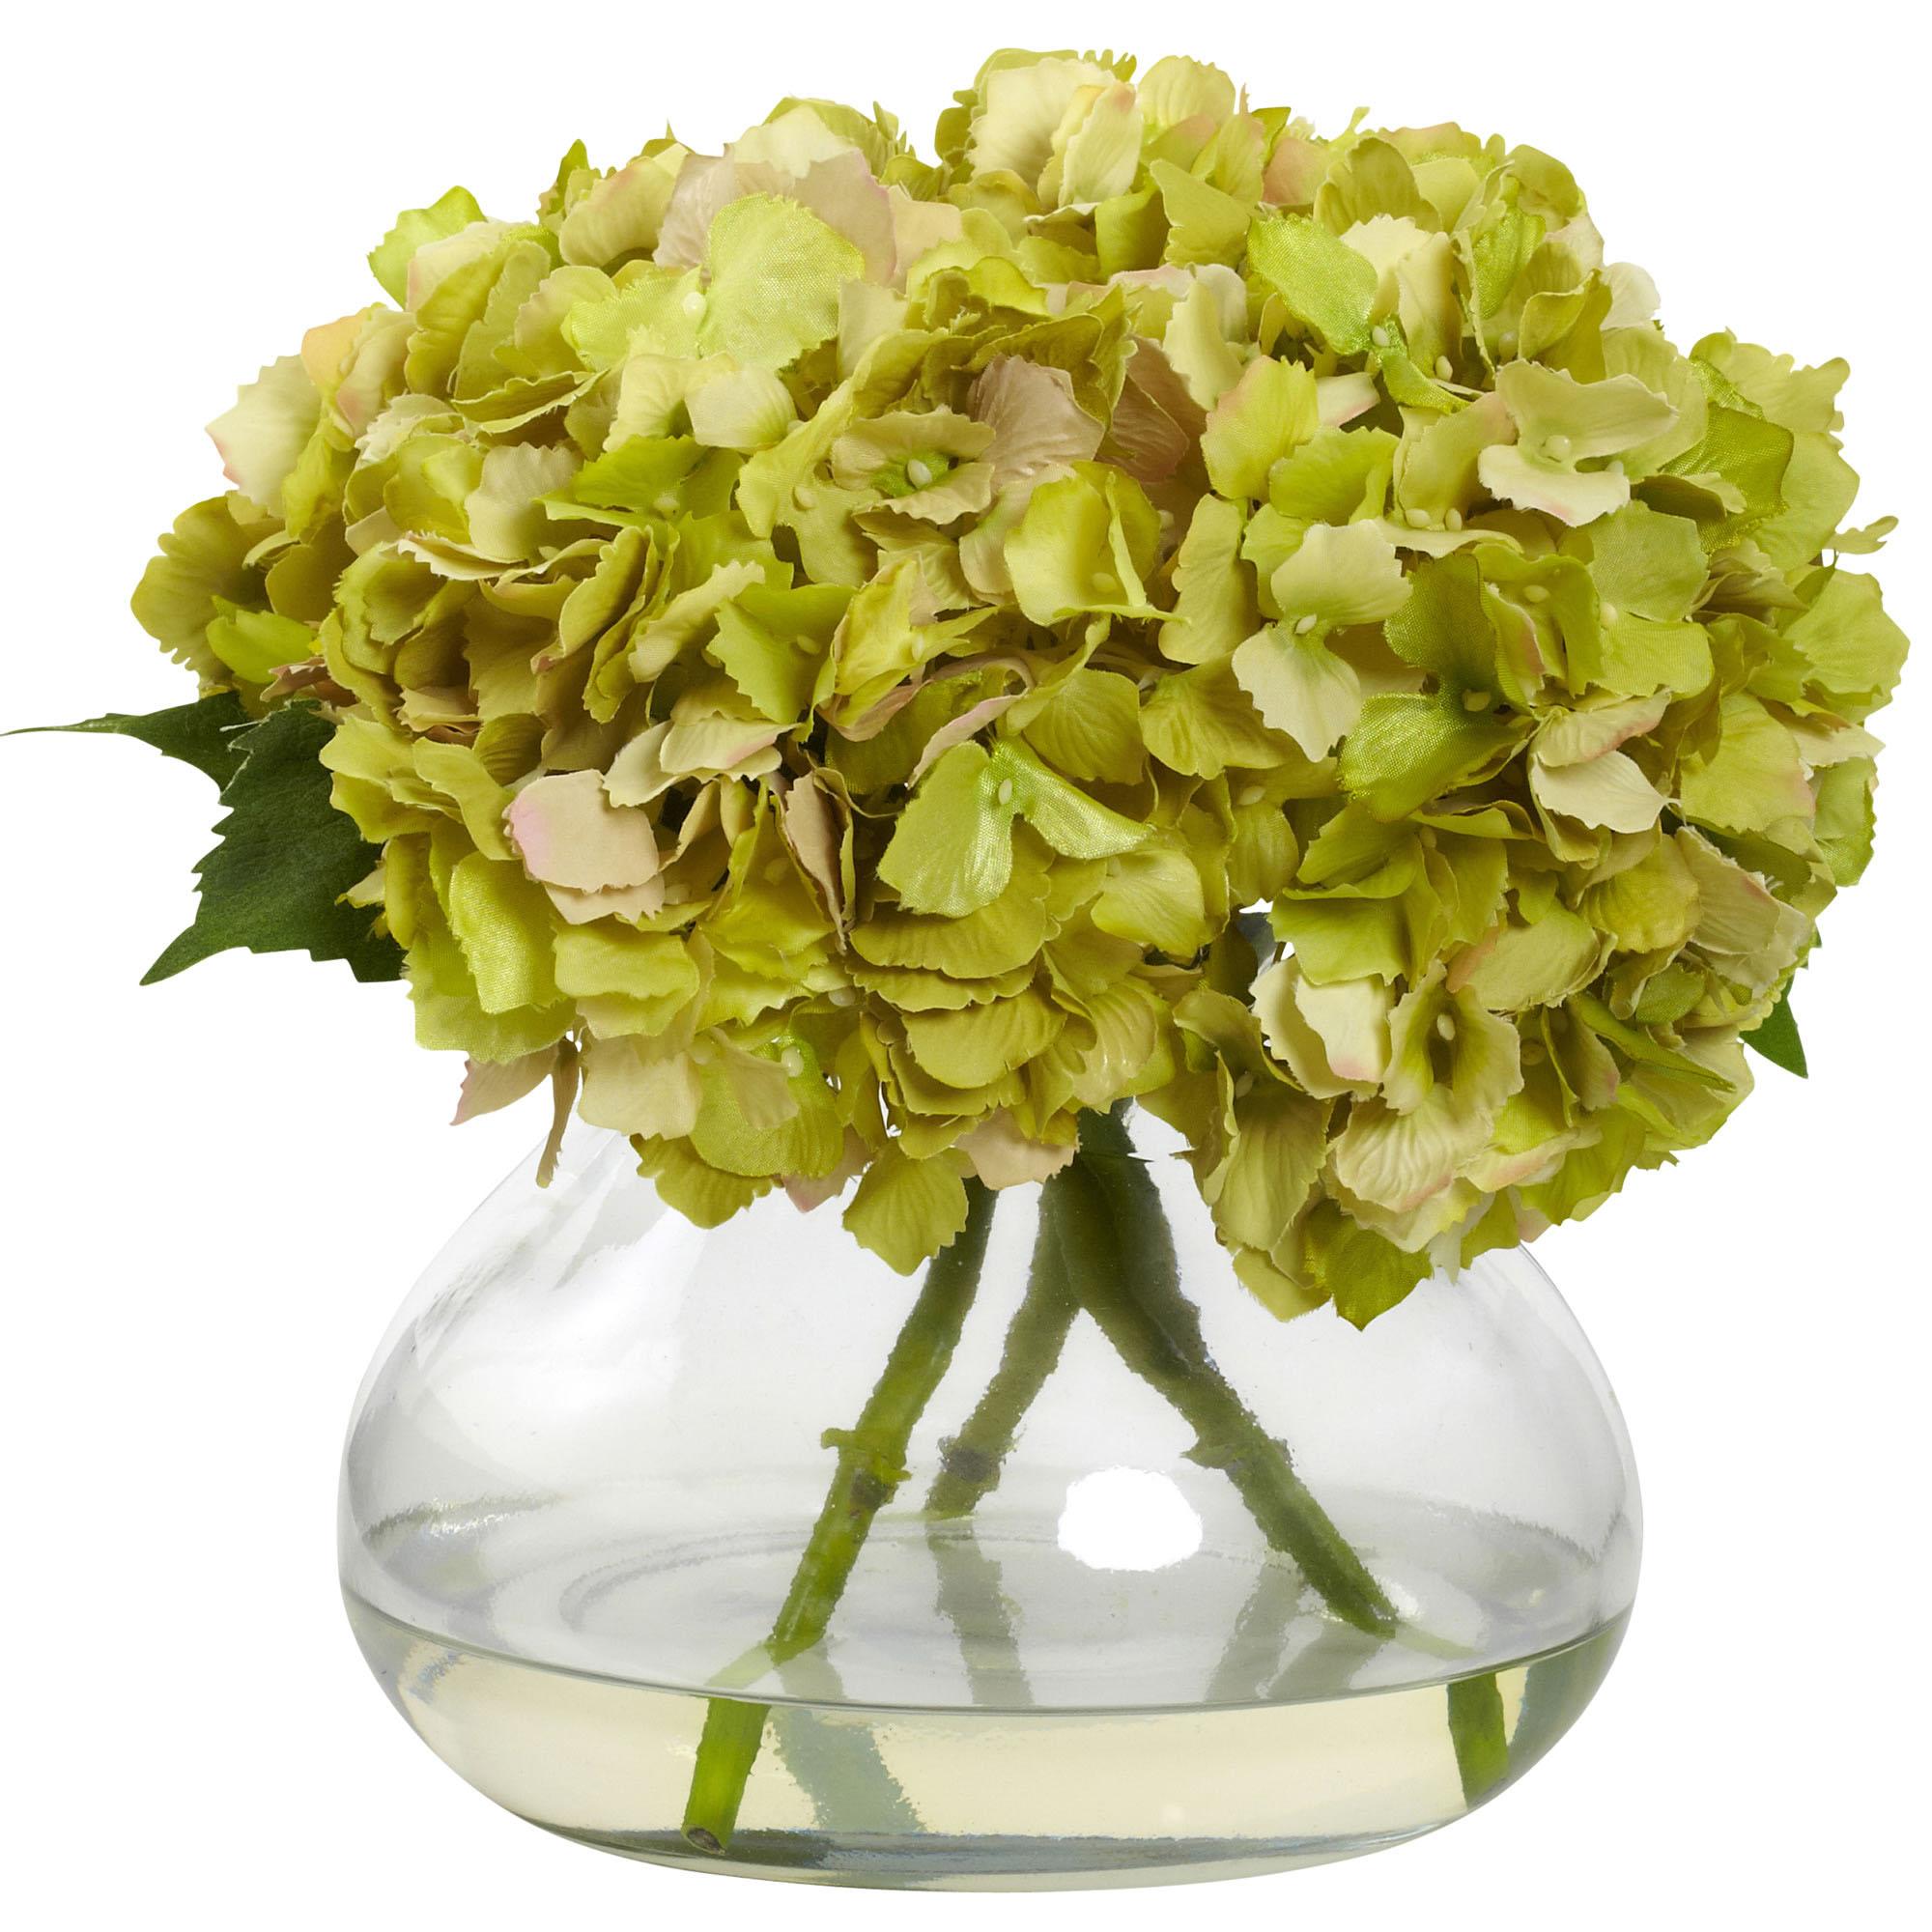 Flower Centerpieces Silk Flowers Fake Flowers